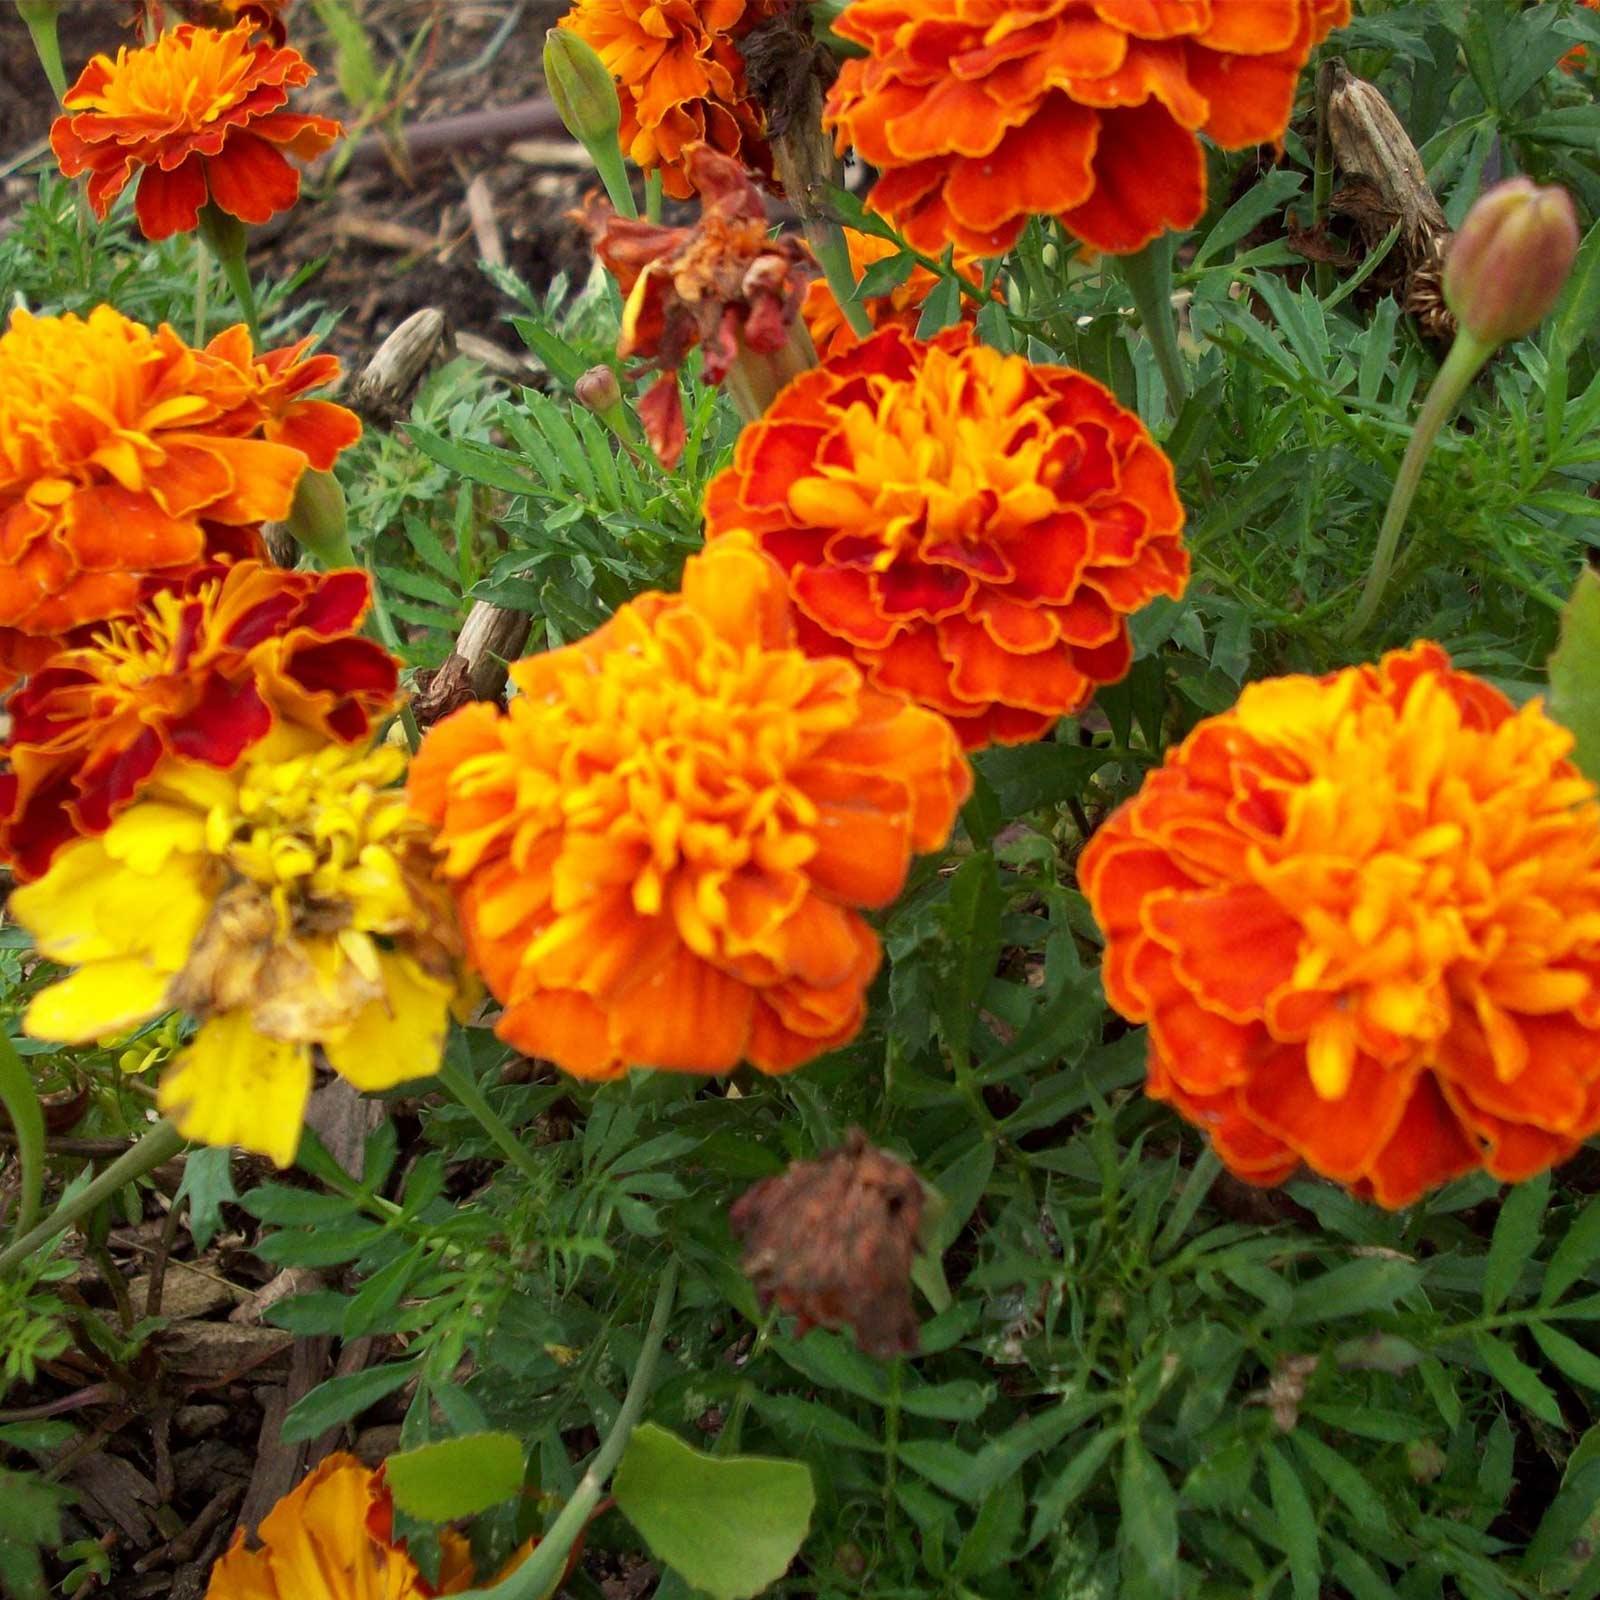 French Marigold Flower Garden Seeds Petite Mixture 1 Lb Annual